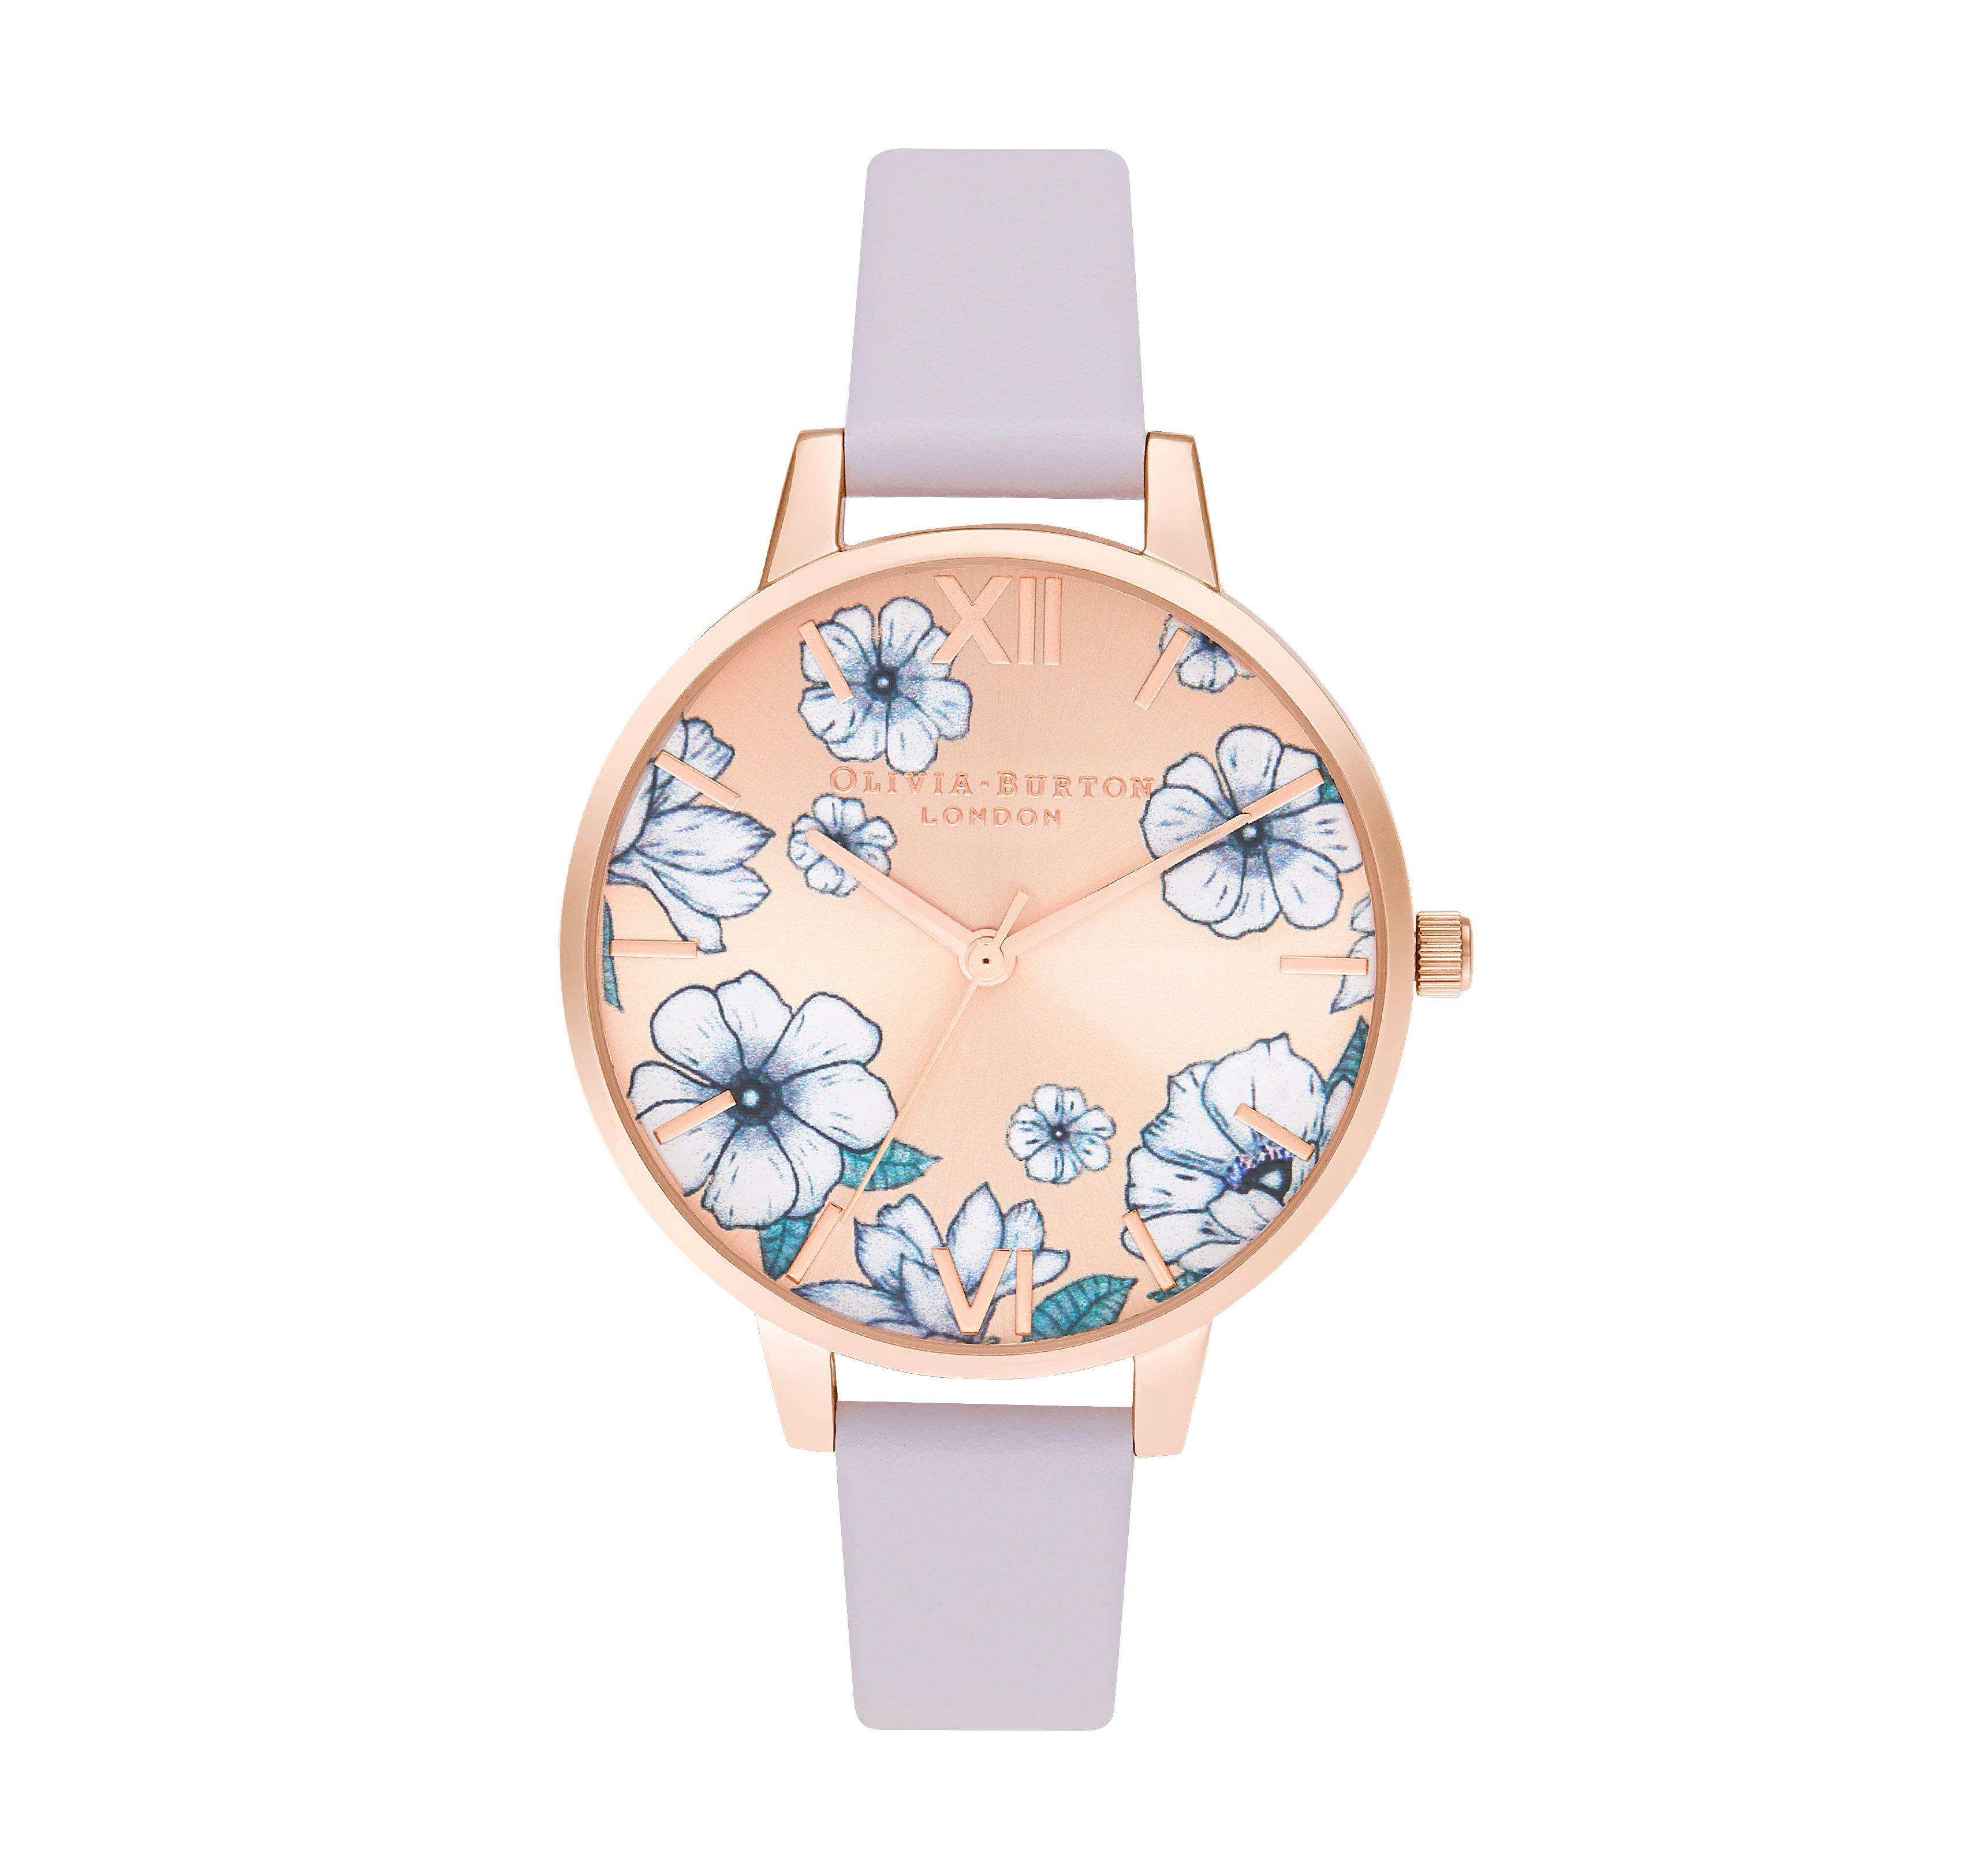 Olivia Burton Groovy Blooms Rose Gold Tone Ladies Watch